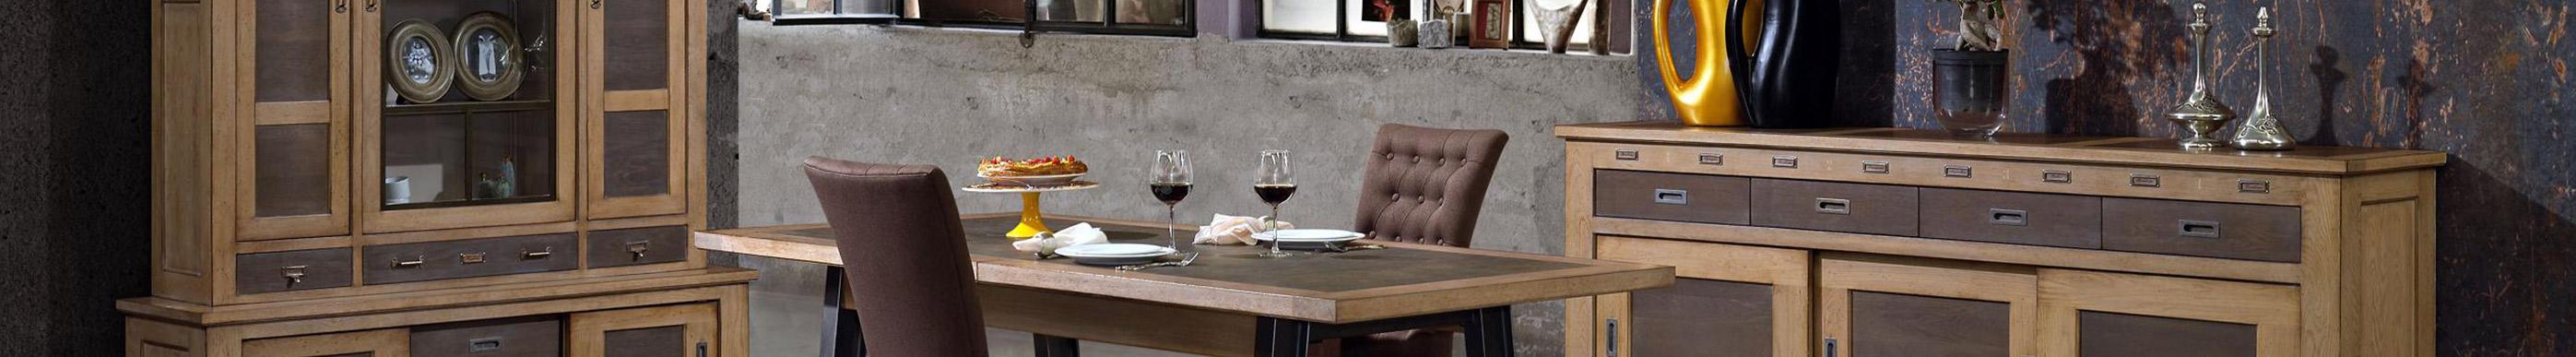 magasin meubles douret belgique sensenruth bouillon contact. Black Bedroom Furniture Sets. Home Design Ideas